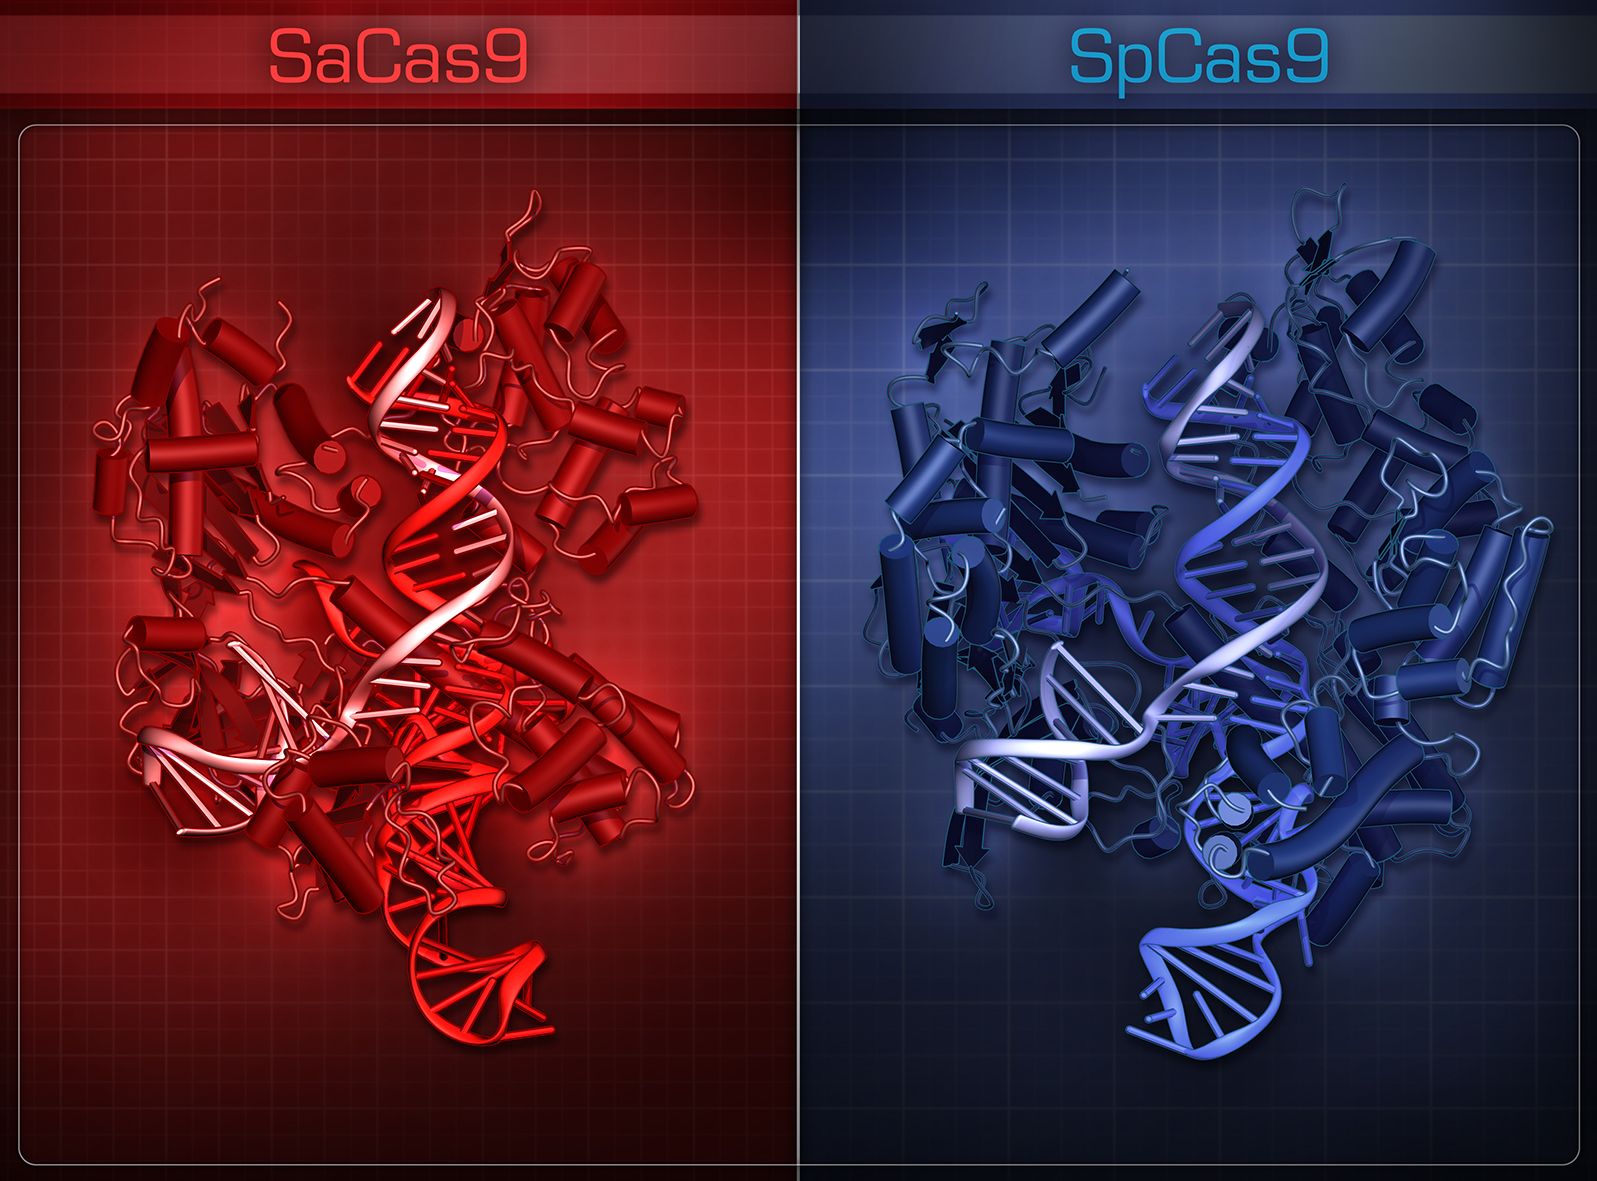 SaCas9_icon.jpg